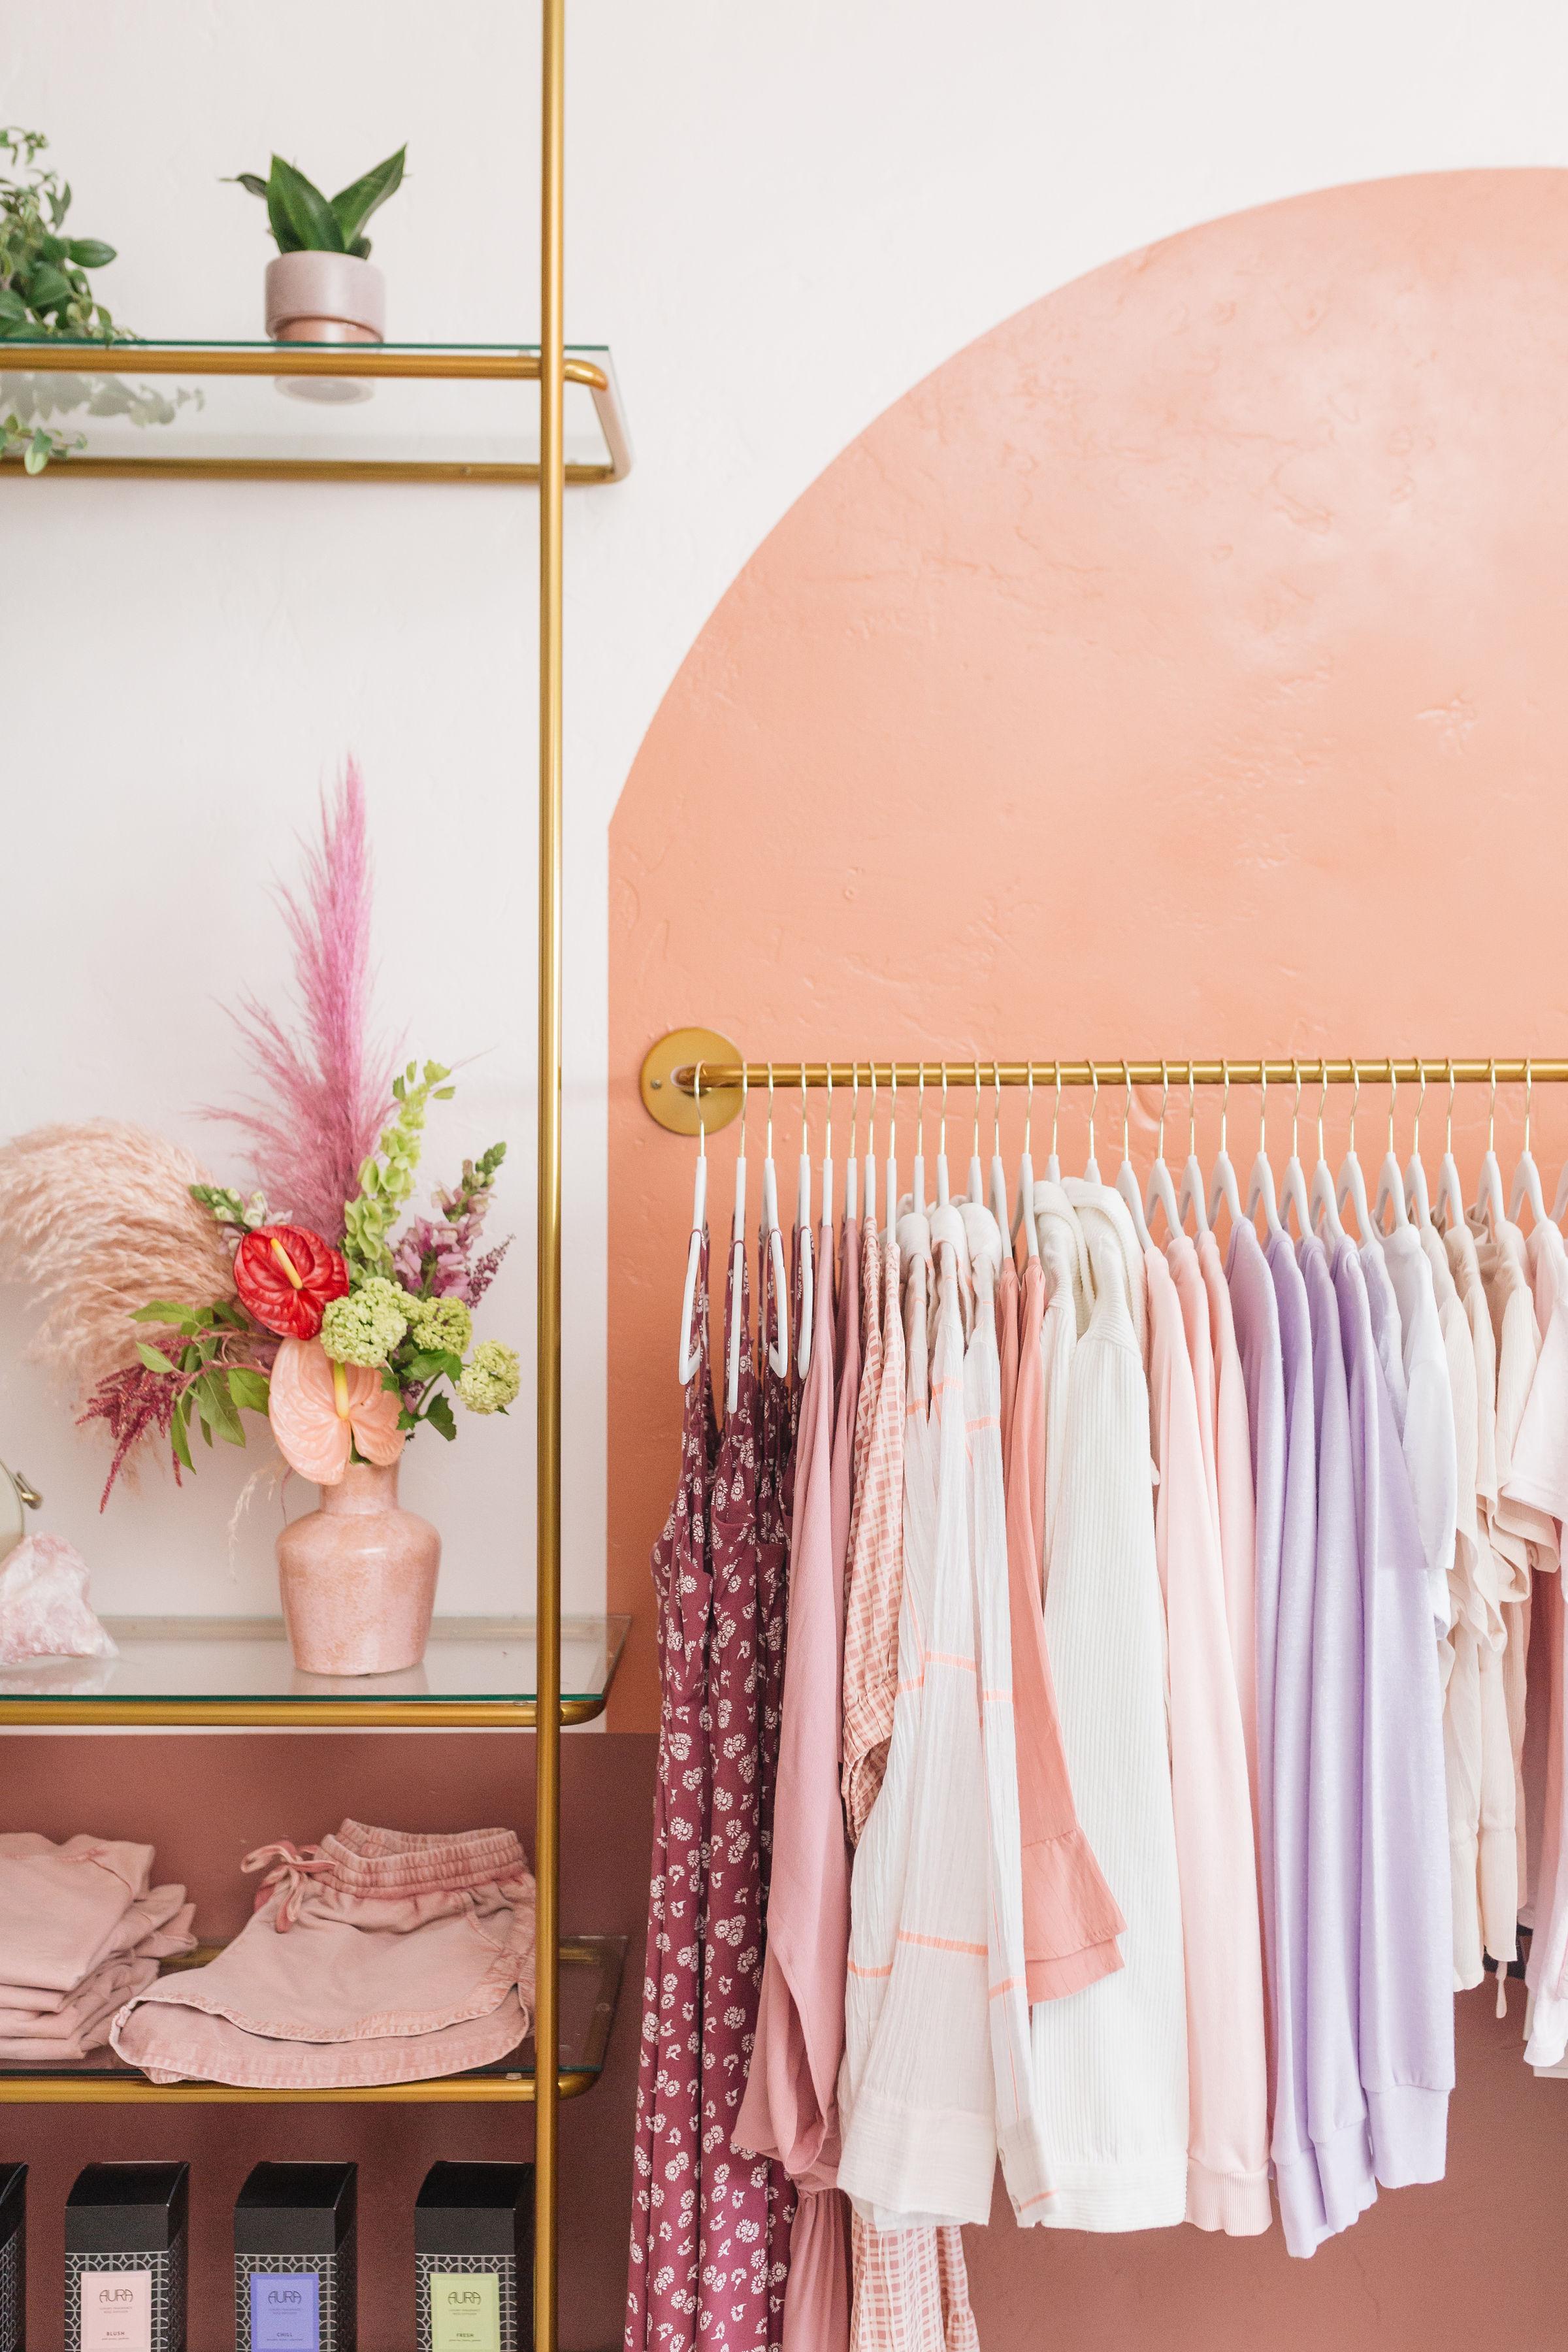 Swirl Boutique